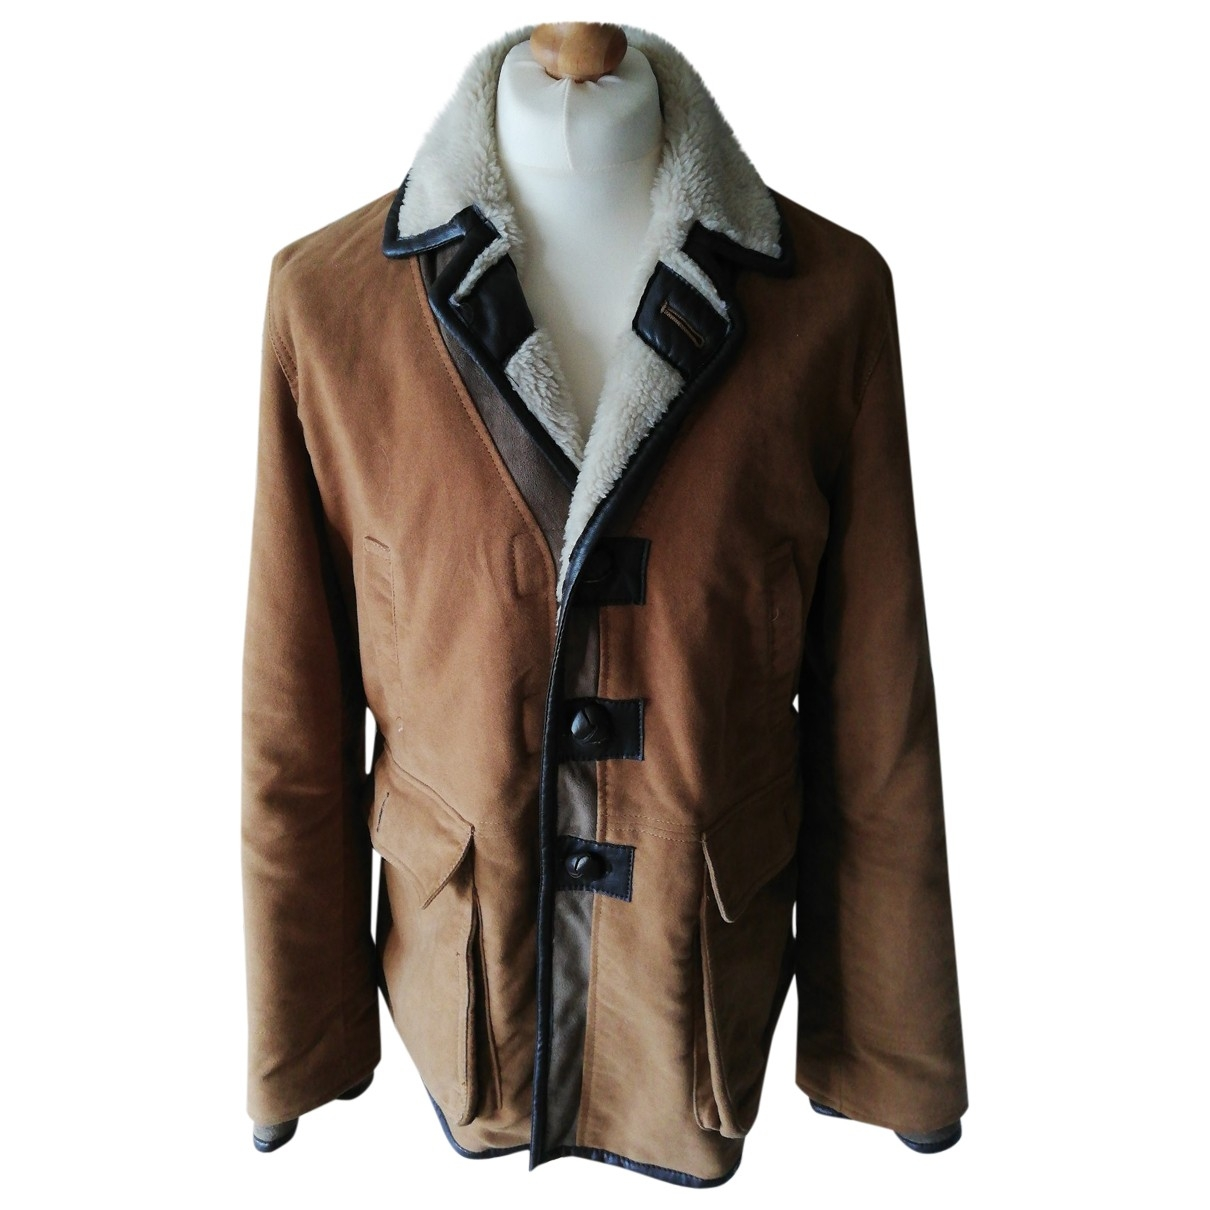 Zara \N Camel Faux fur jacket  for Men XL International